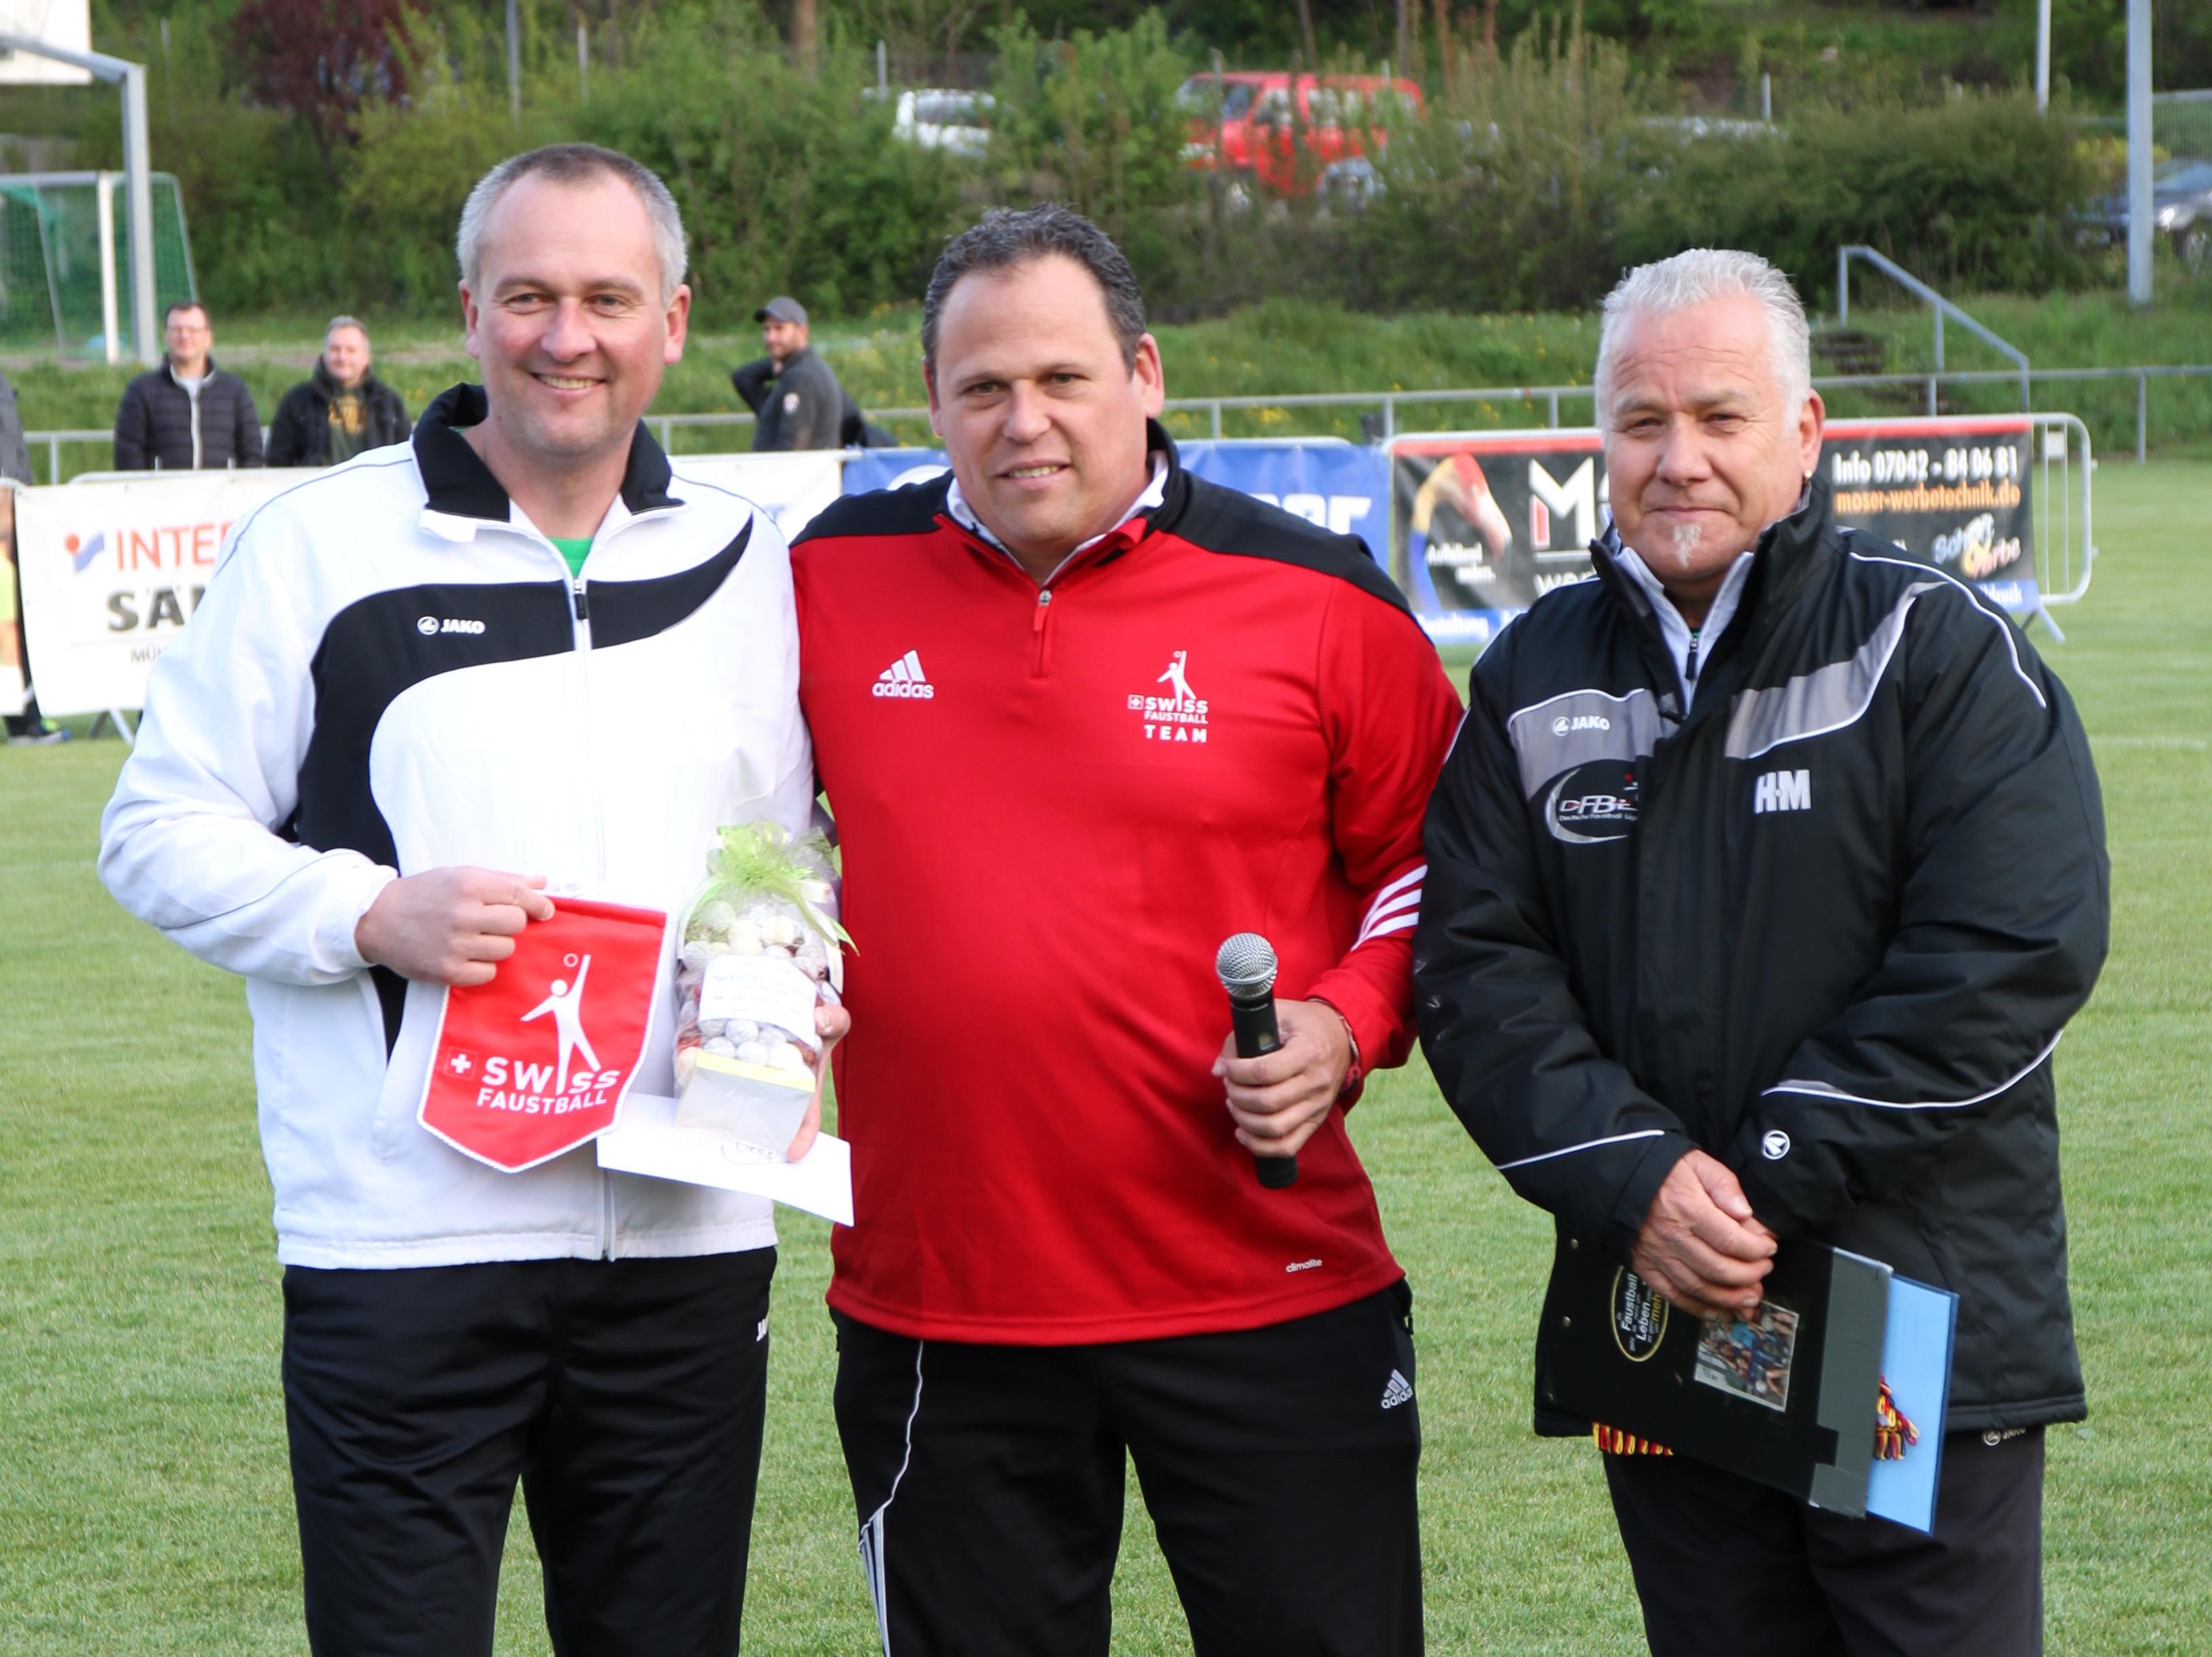 Jubilar Olaf Neurnfeld (v. r.) mit Schweiz-Coach Oliver Lang und DFBL-Präsidiumsmitglied Harald Muckenfuß.